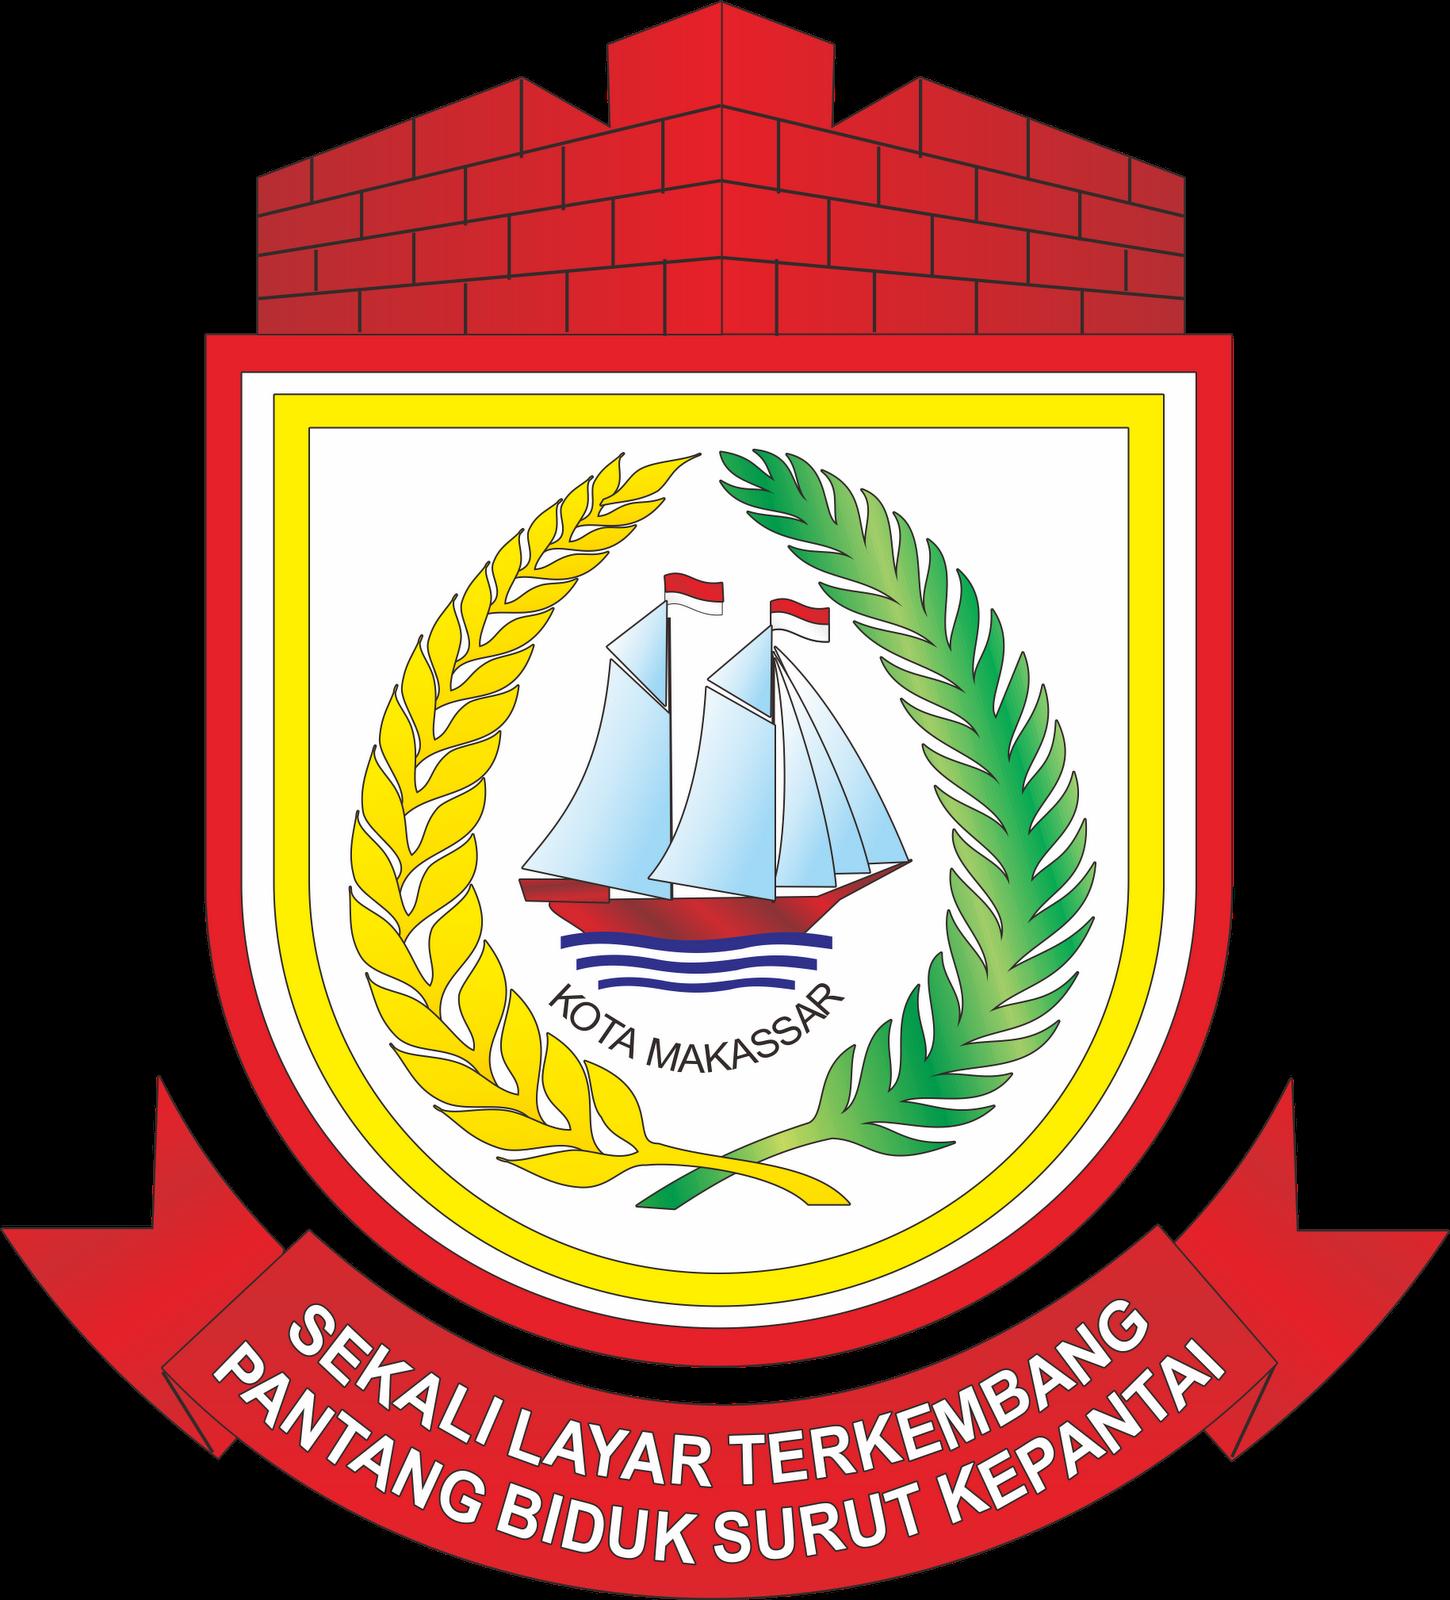 Kota Makassar Kota makassar, Kota